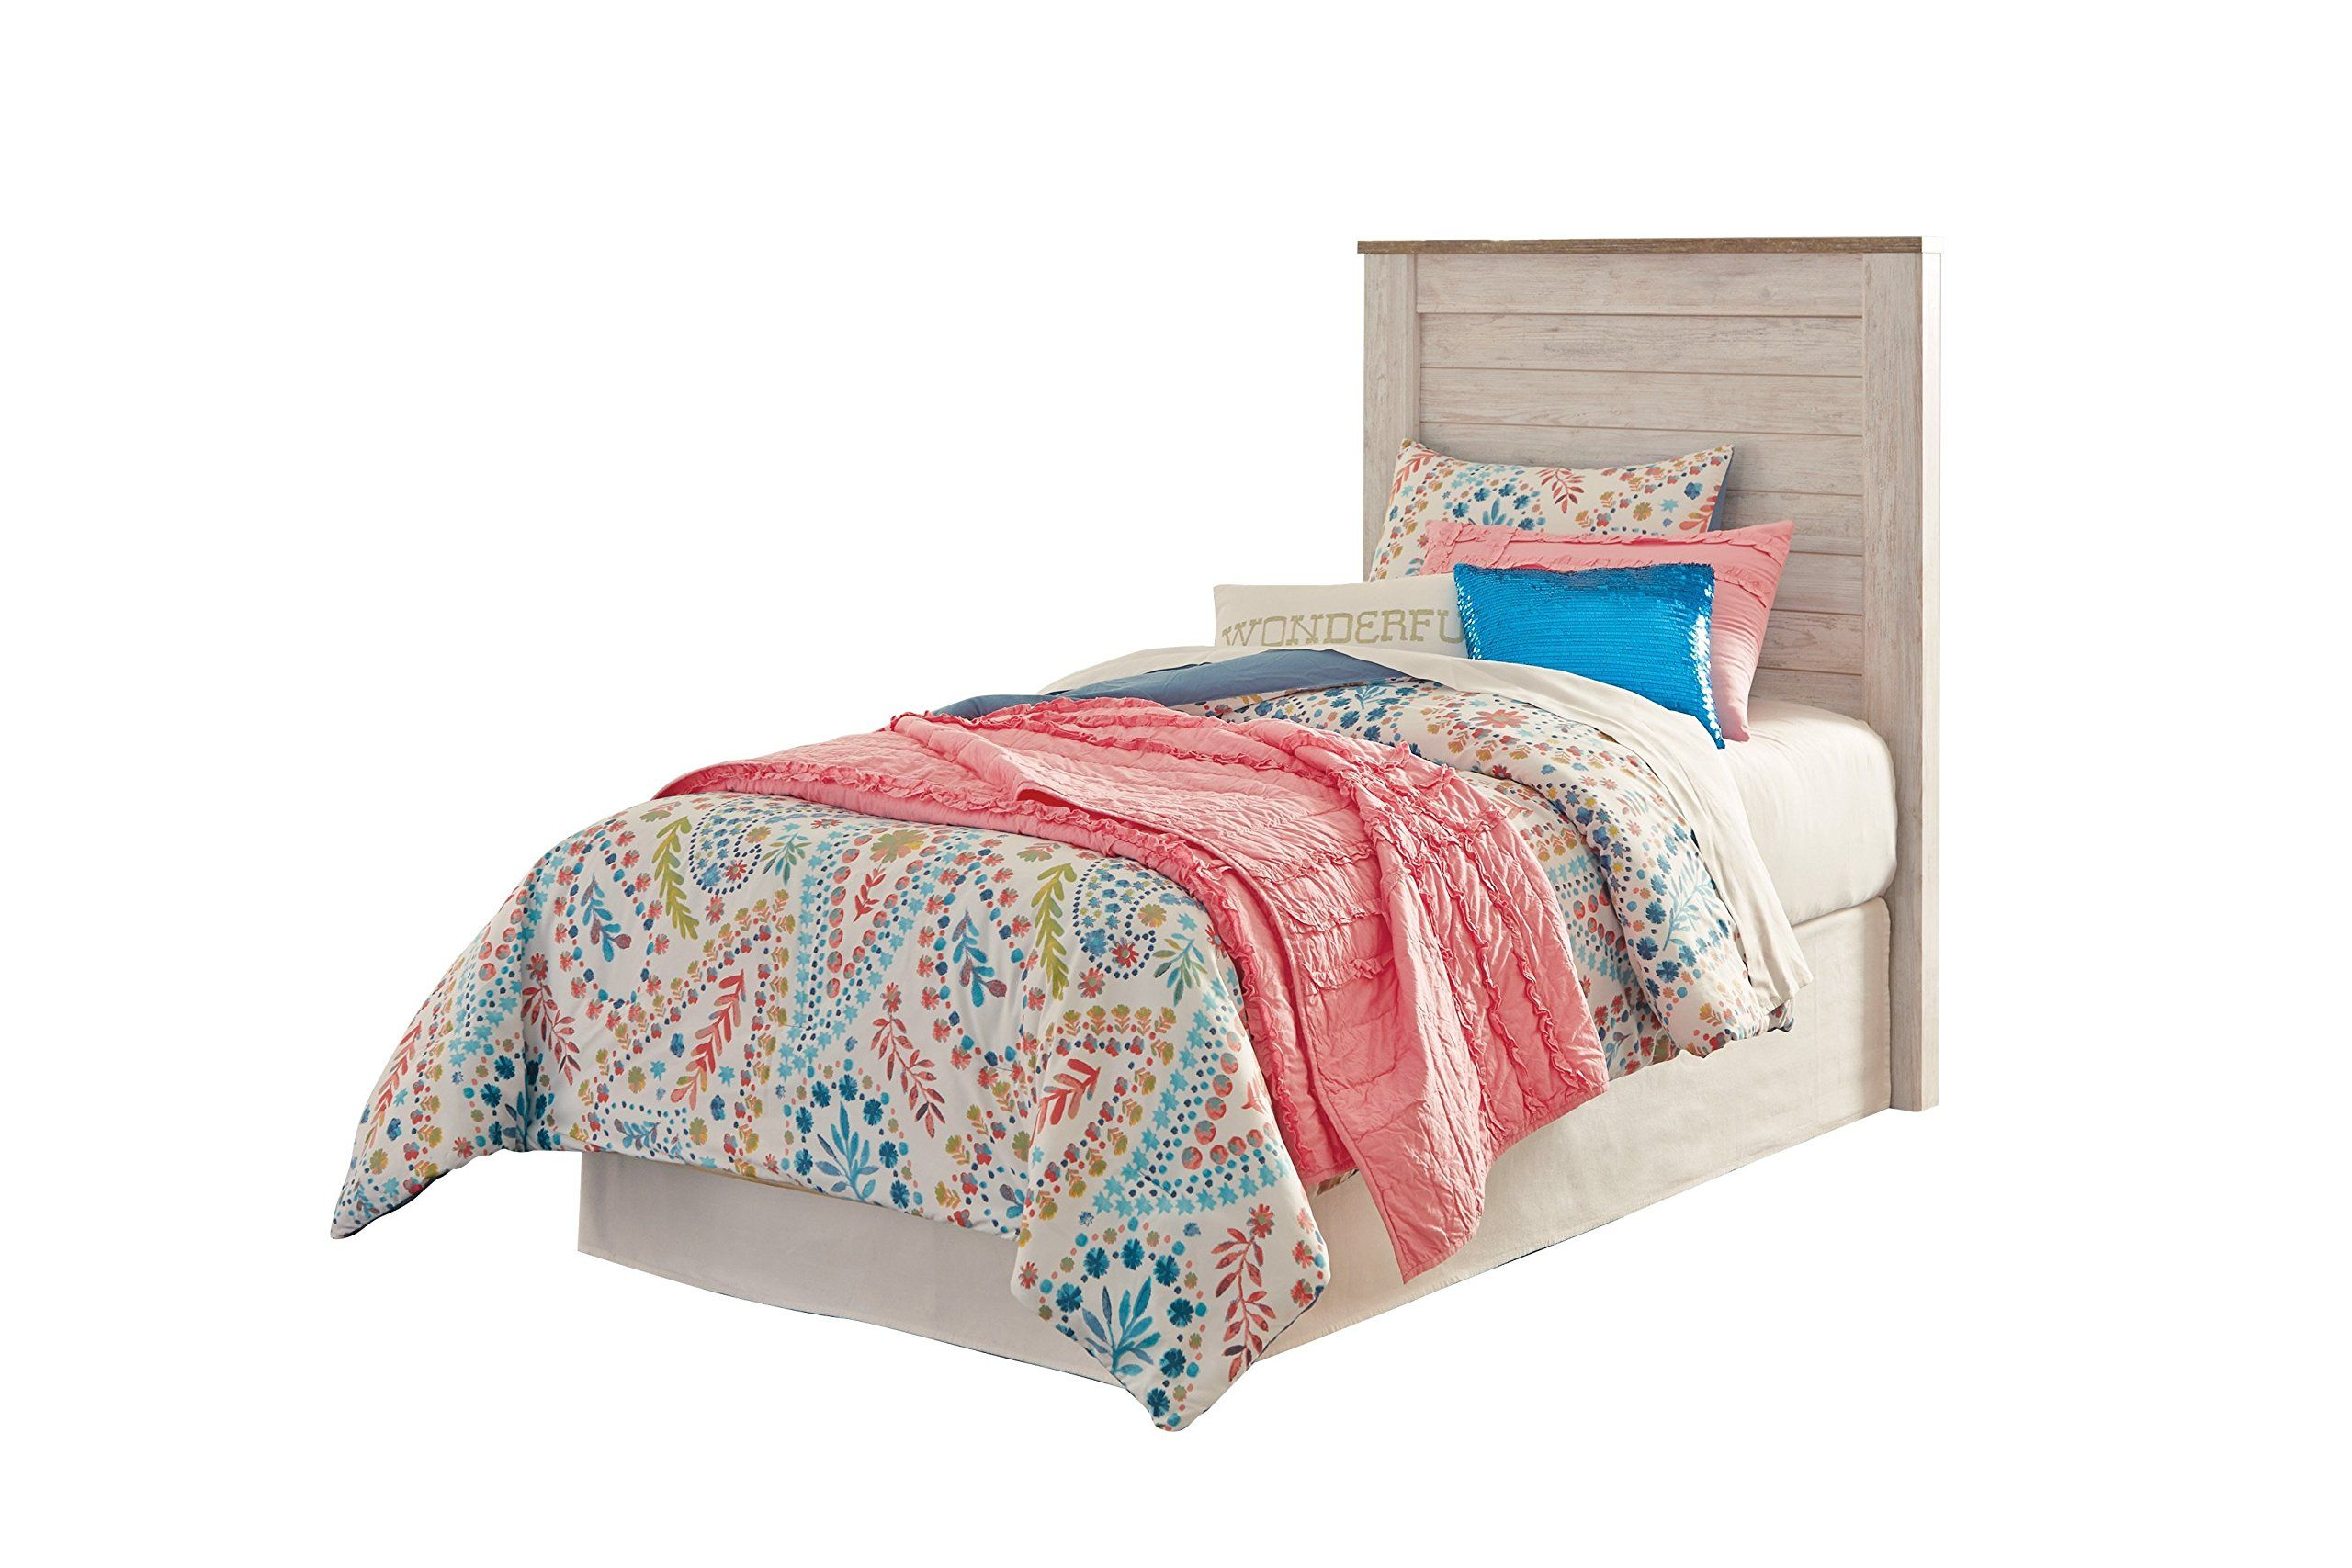 Ashley Willowton 5PC Twin Panel Headboard Bedroom Set With